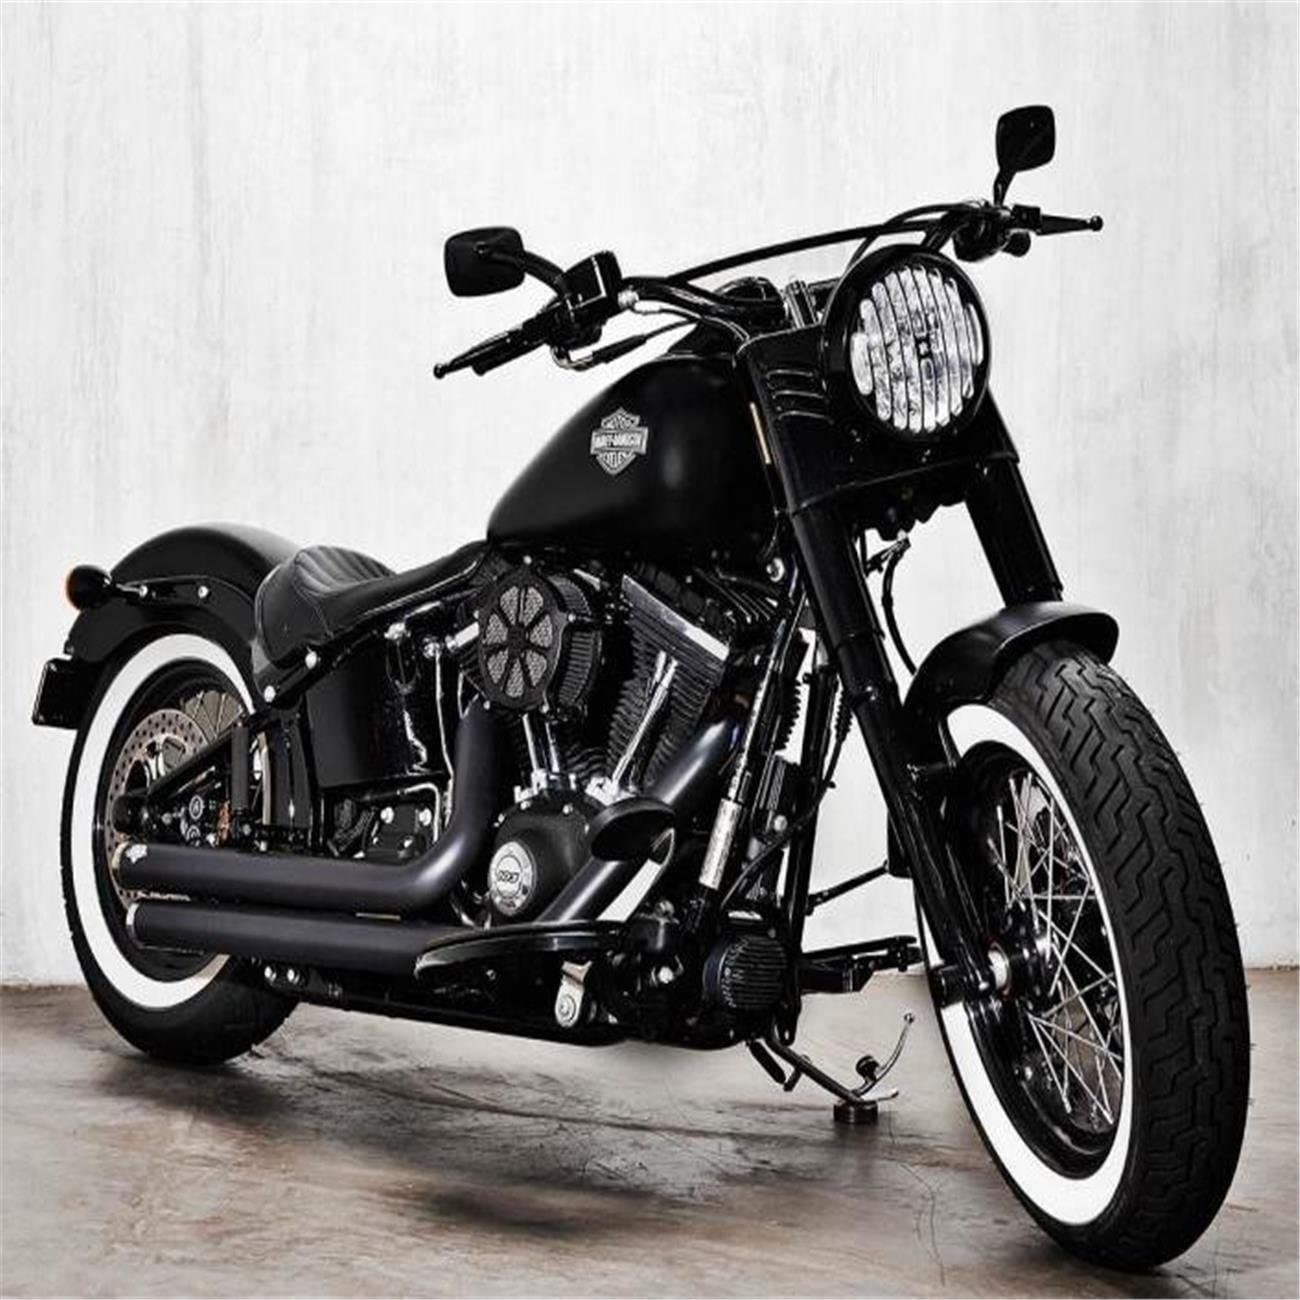 CICMOD Motorrad Solo Sitz Front solo Seat f/ür Harley Davidson XL883 XL1200 X4